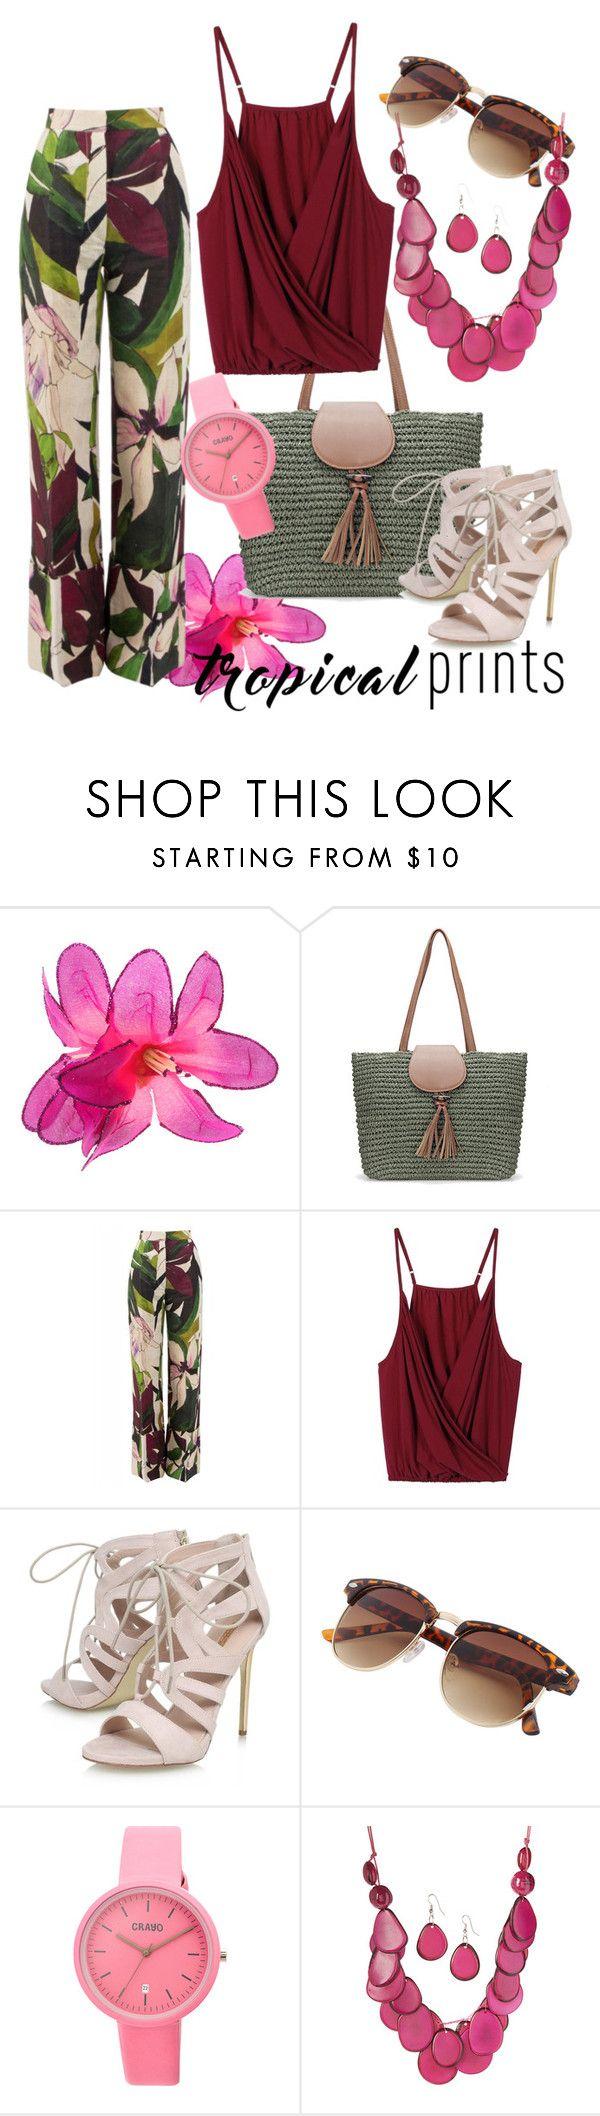 """Hot Tropics"" by ilsedut ❤ liked on Polyvore featuring Erika Cavallini Semi-Couture, Carvela, Crayo, tropicalprints and hottropics"